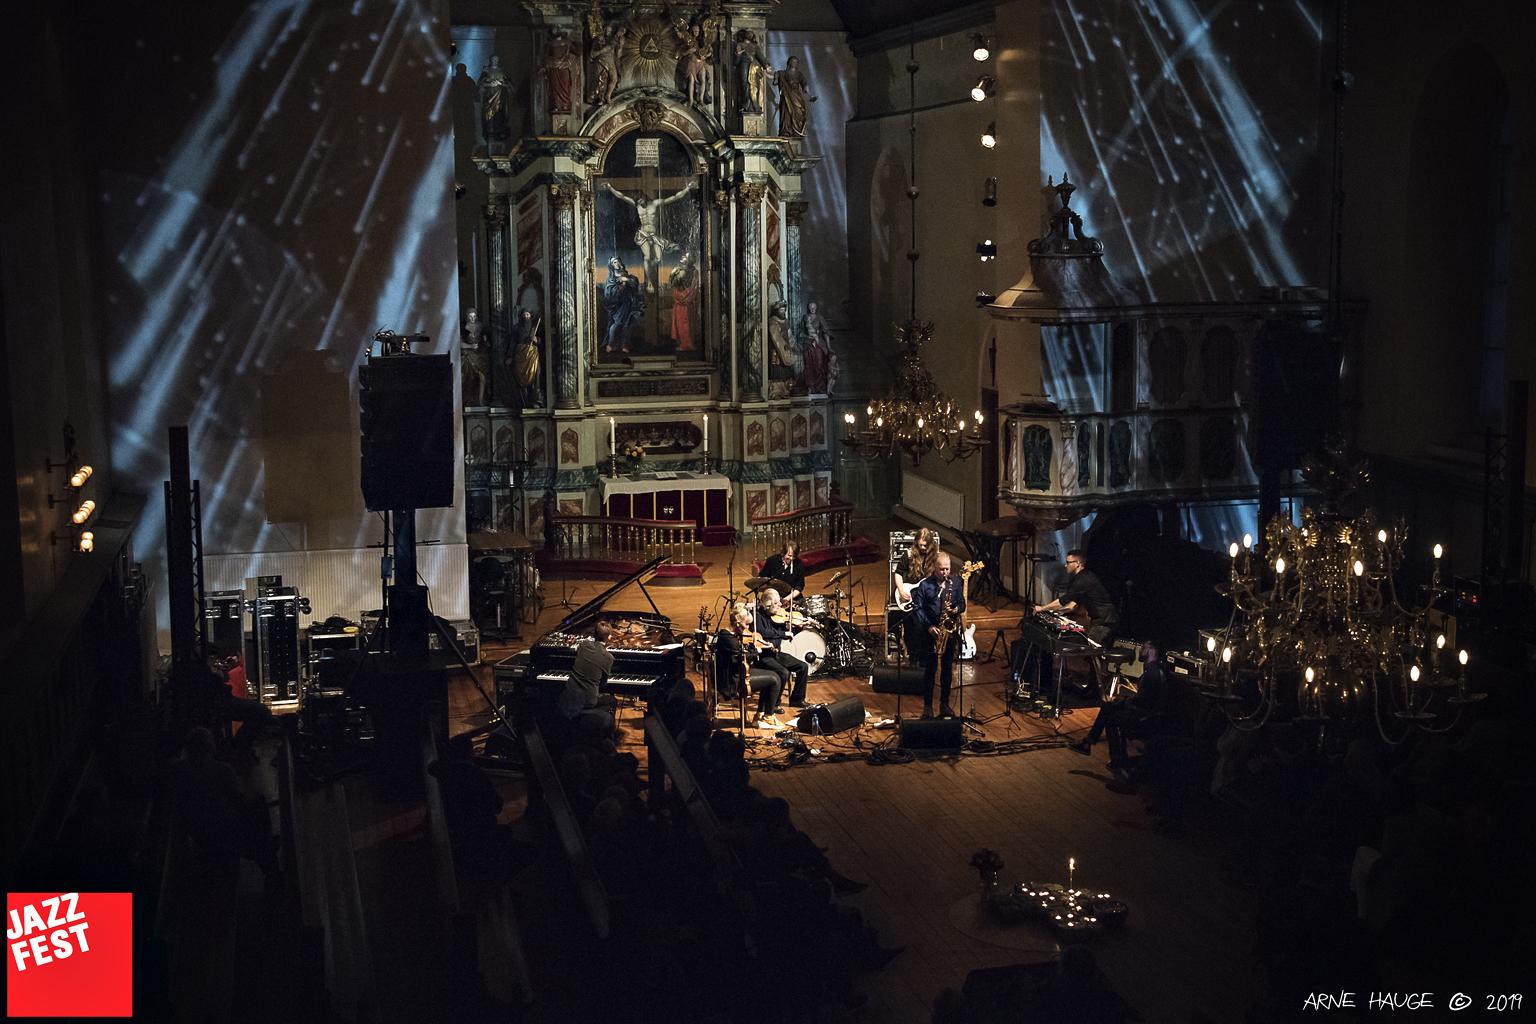 190510 Karl Seglems WorldJazz @ Vår Frue Kirke - foto Arne Hauge_013.jpg